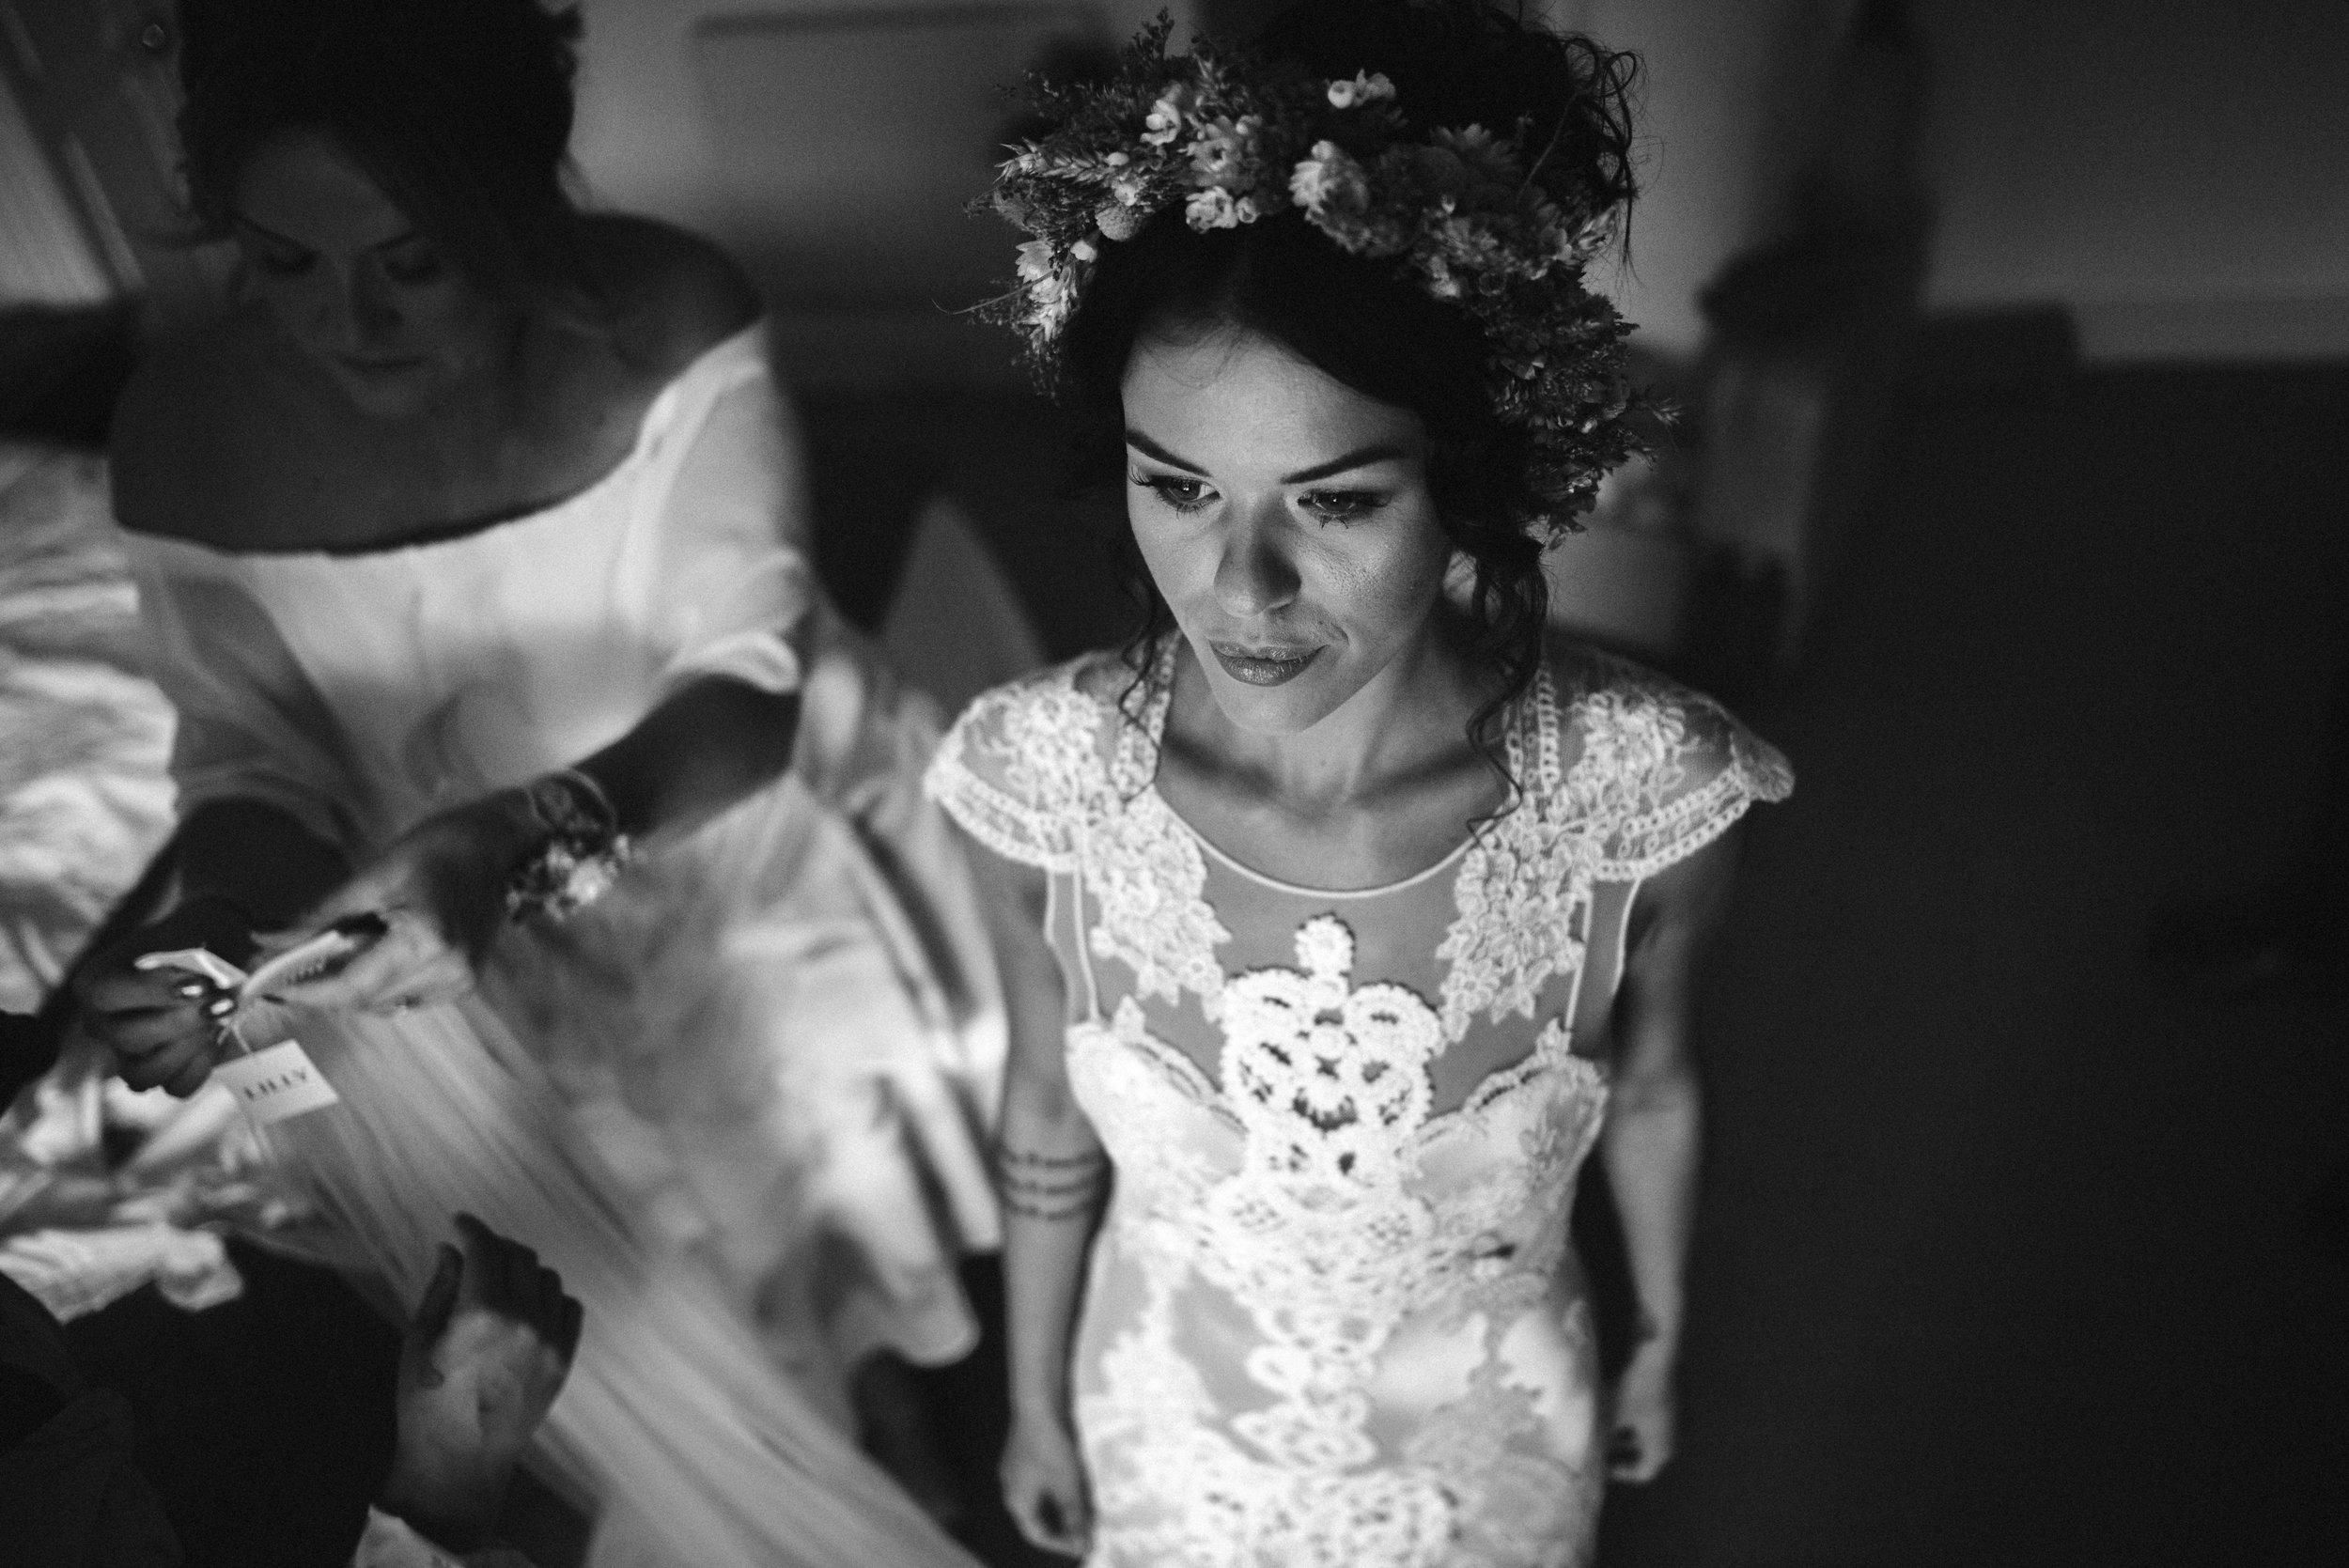 pengenna-manor-wedding-photographer-22.jpg